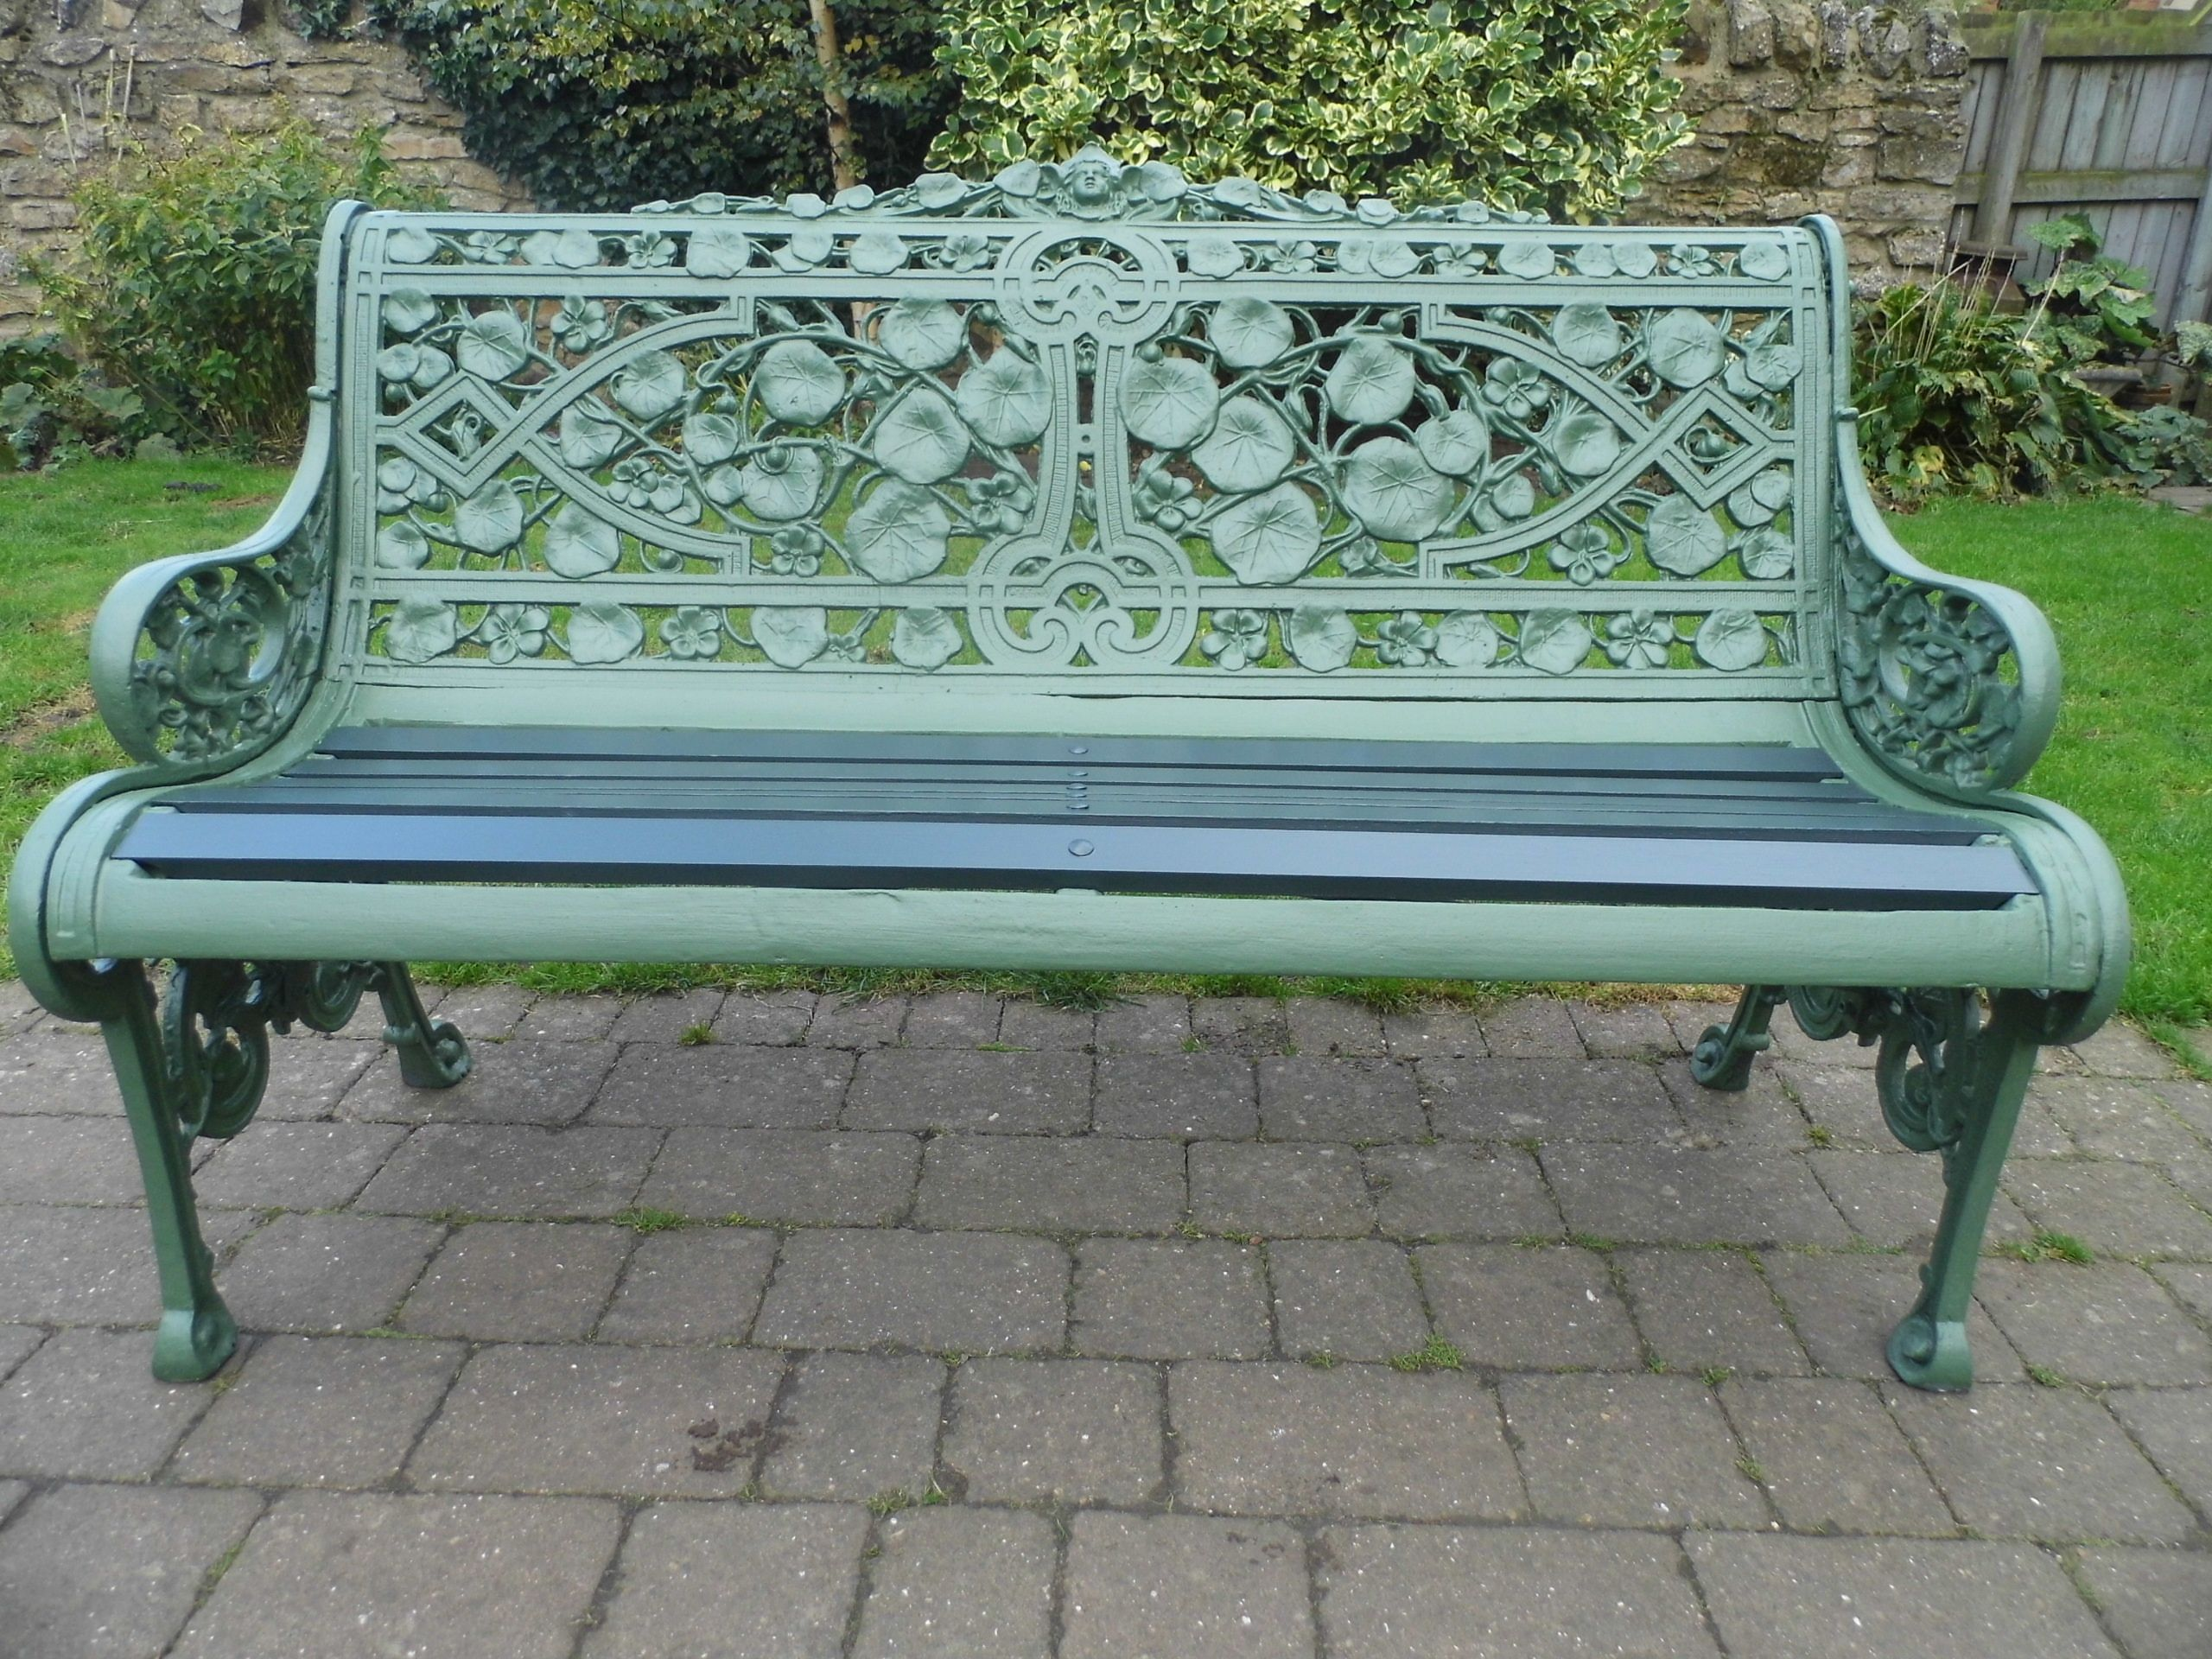 Coalbrookdale Nasturtium Bench Refurbished By Thompsons Garden